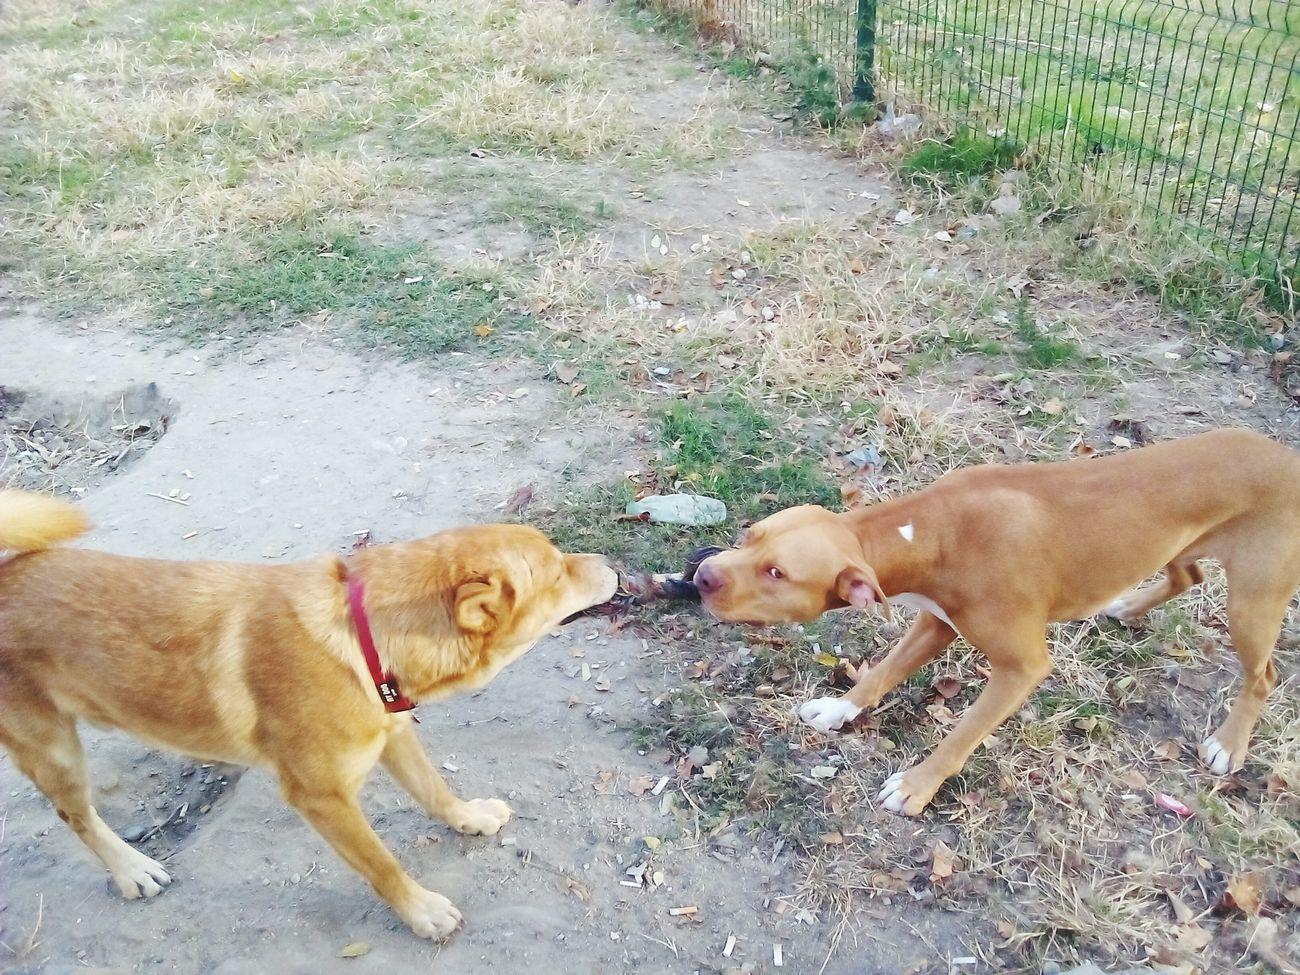 Верни приятели. Dog Pets Domestic Animals Animal Themes Day Togetherness Outdoors Mammal Bonding Friendship Low Section People Adult